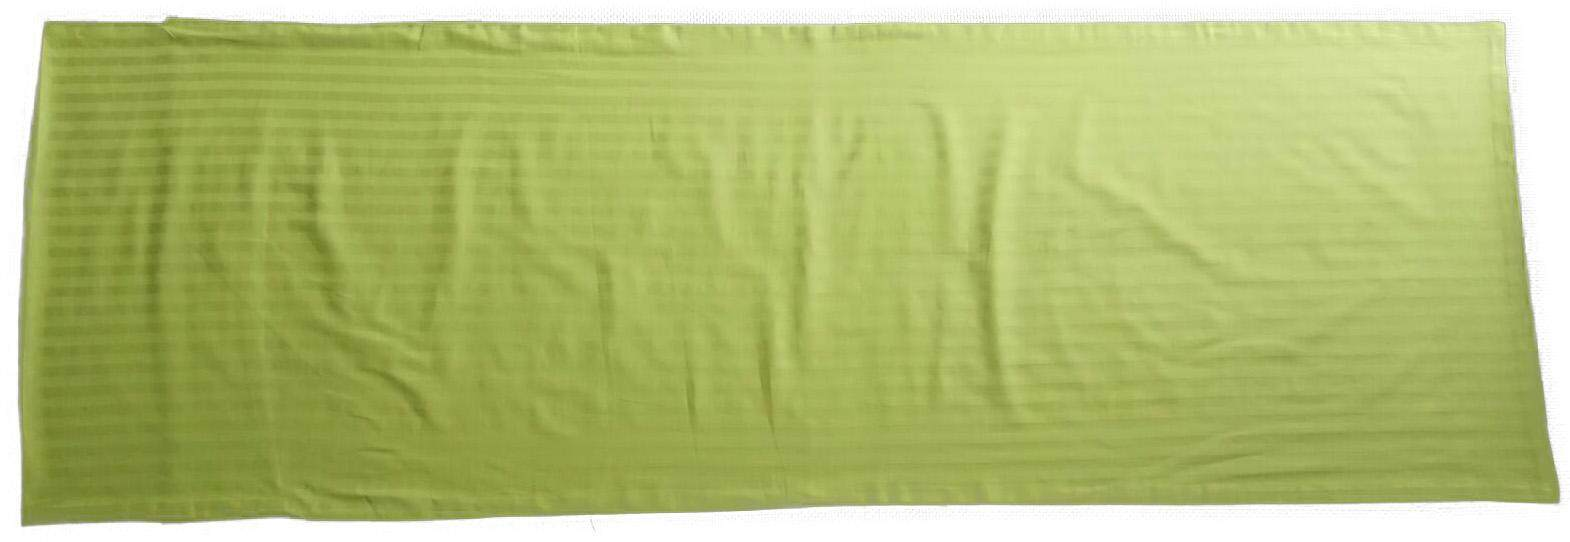 Body Pillow Cover (Green) 1.jpg